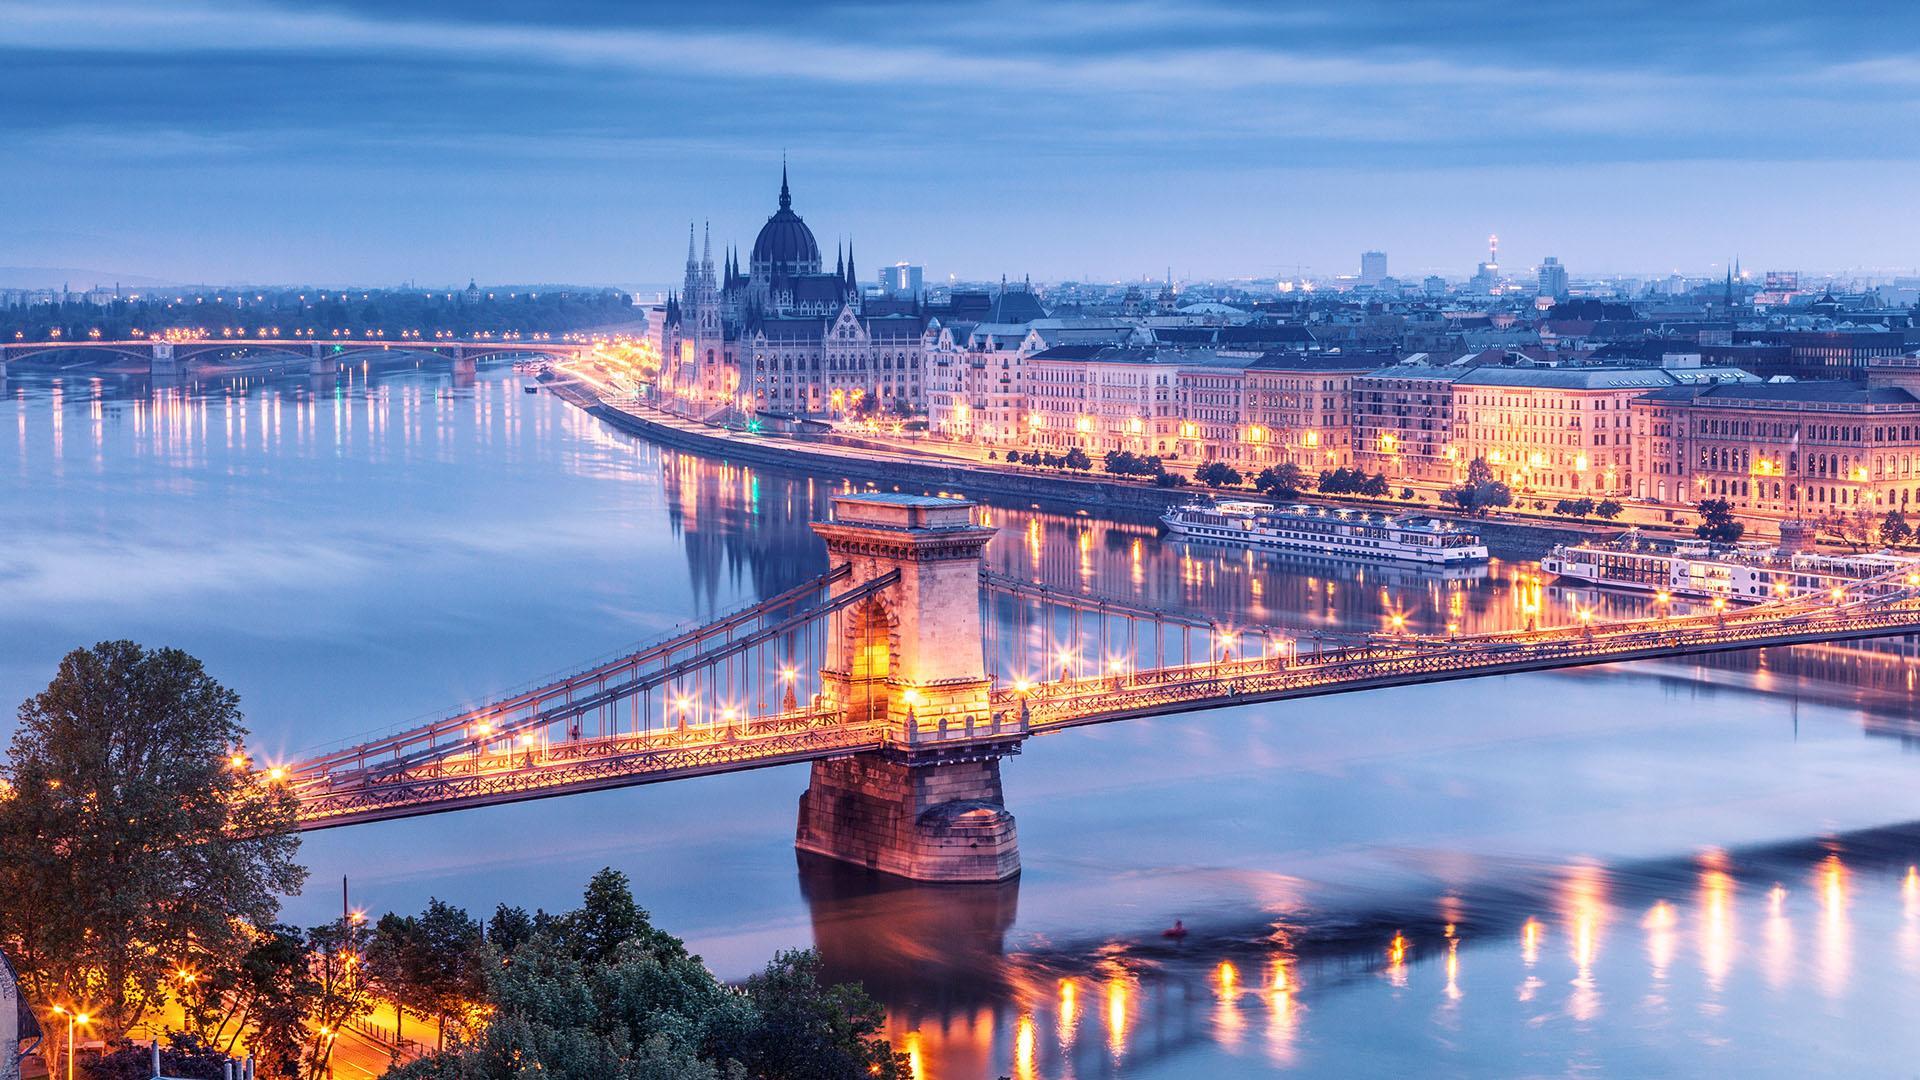 تور مجارستان فرانسه